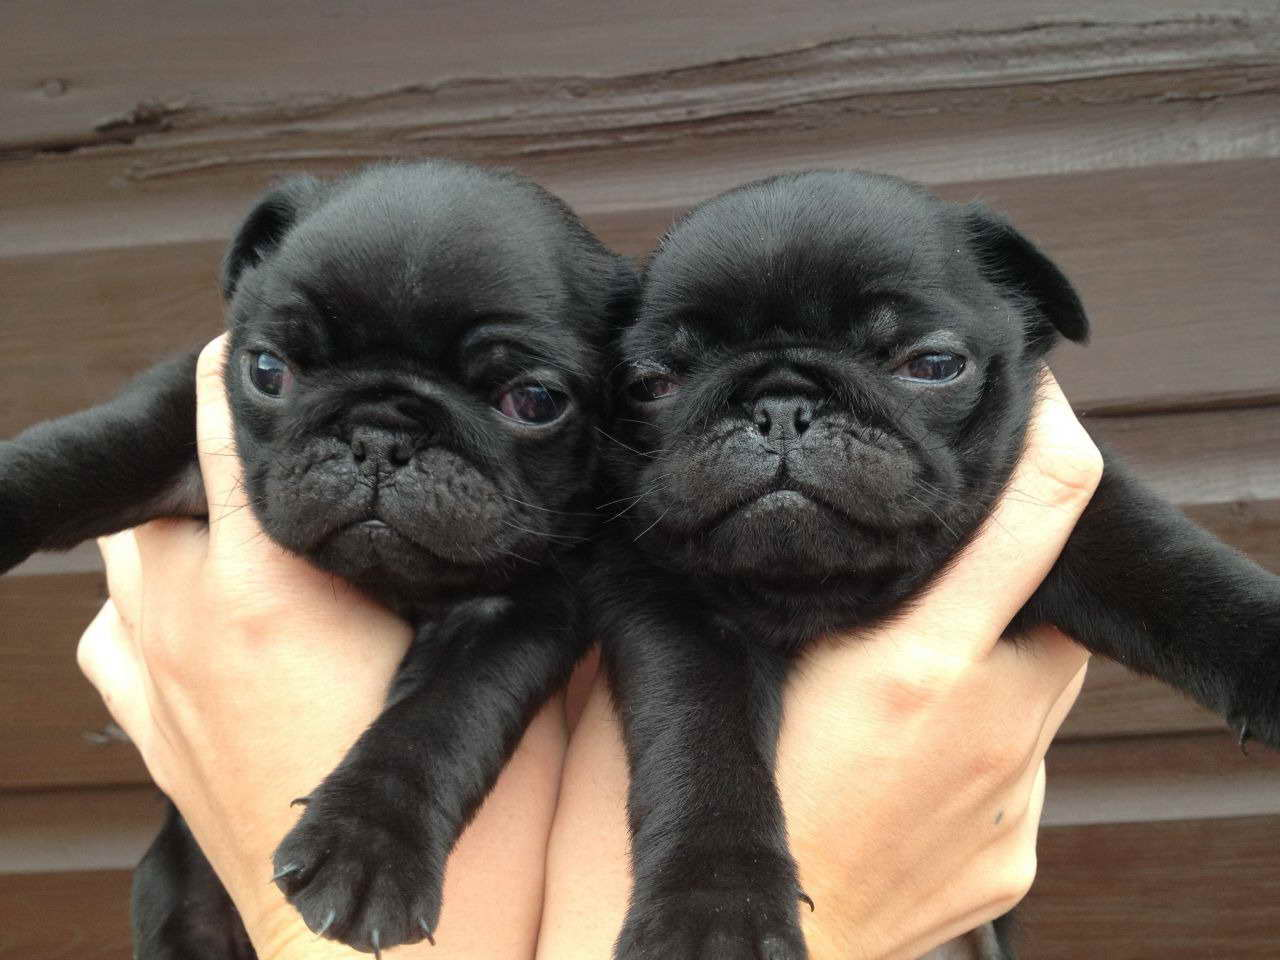 Favorite Dogs Pug Cross Husky Mix Pug Pomeranian Husky Mix Black Pug Dog Sale Black Pug Dog Sale Pets bark post Pug Husky Mix